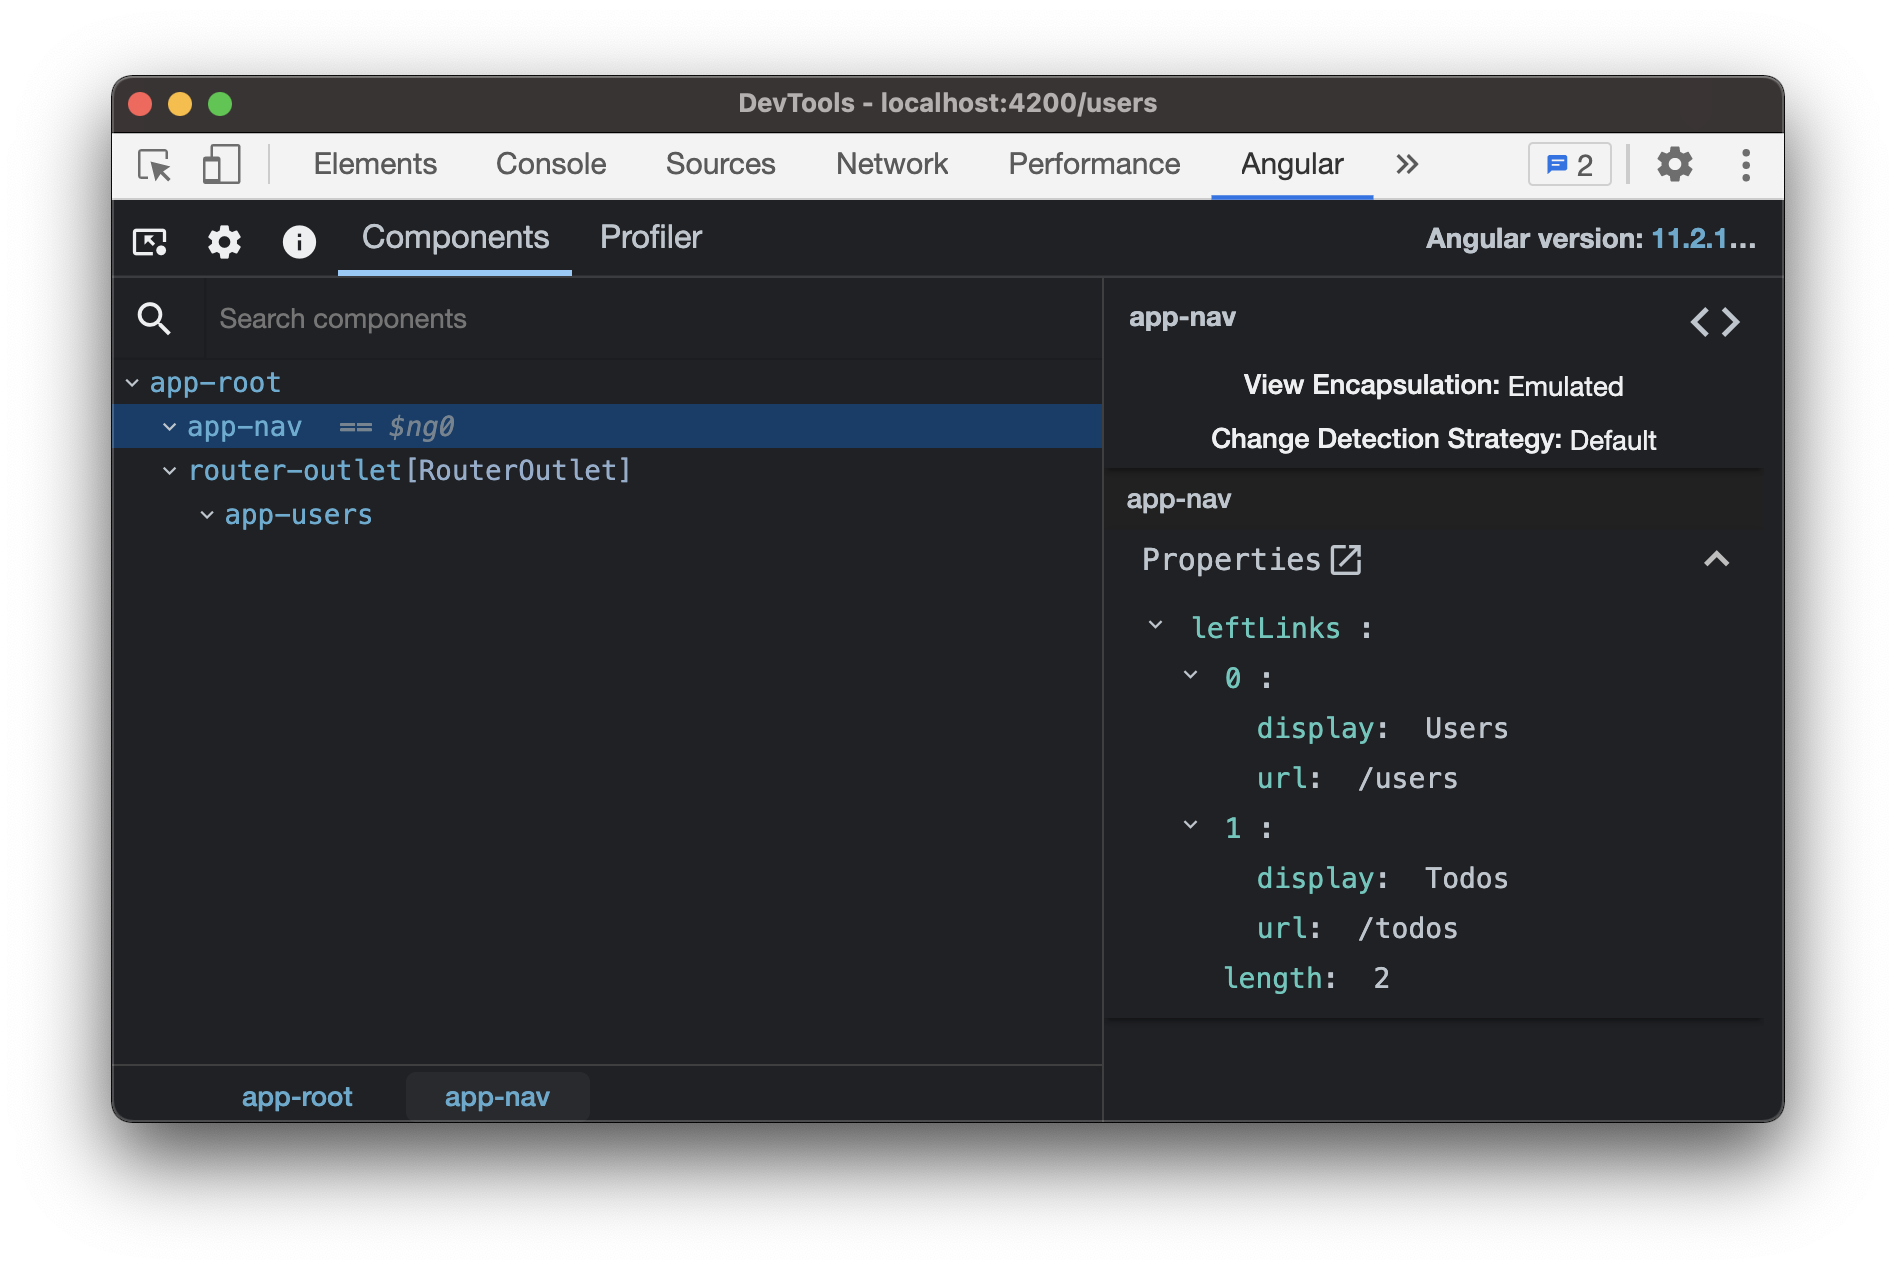 Angular dev tools showing the app-nav component